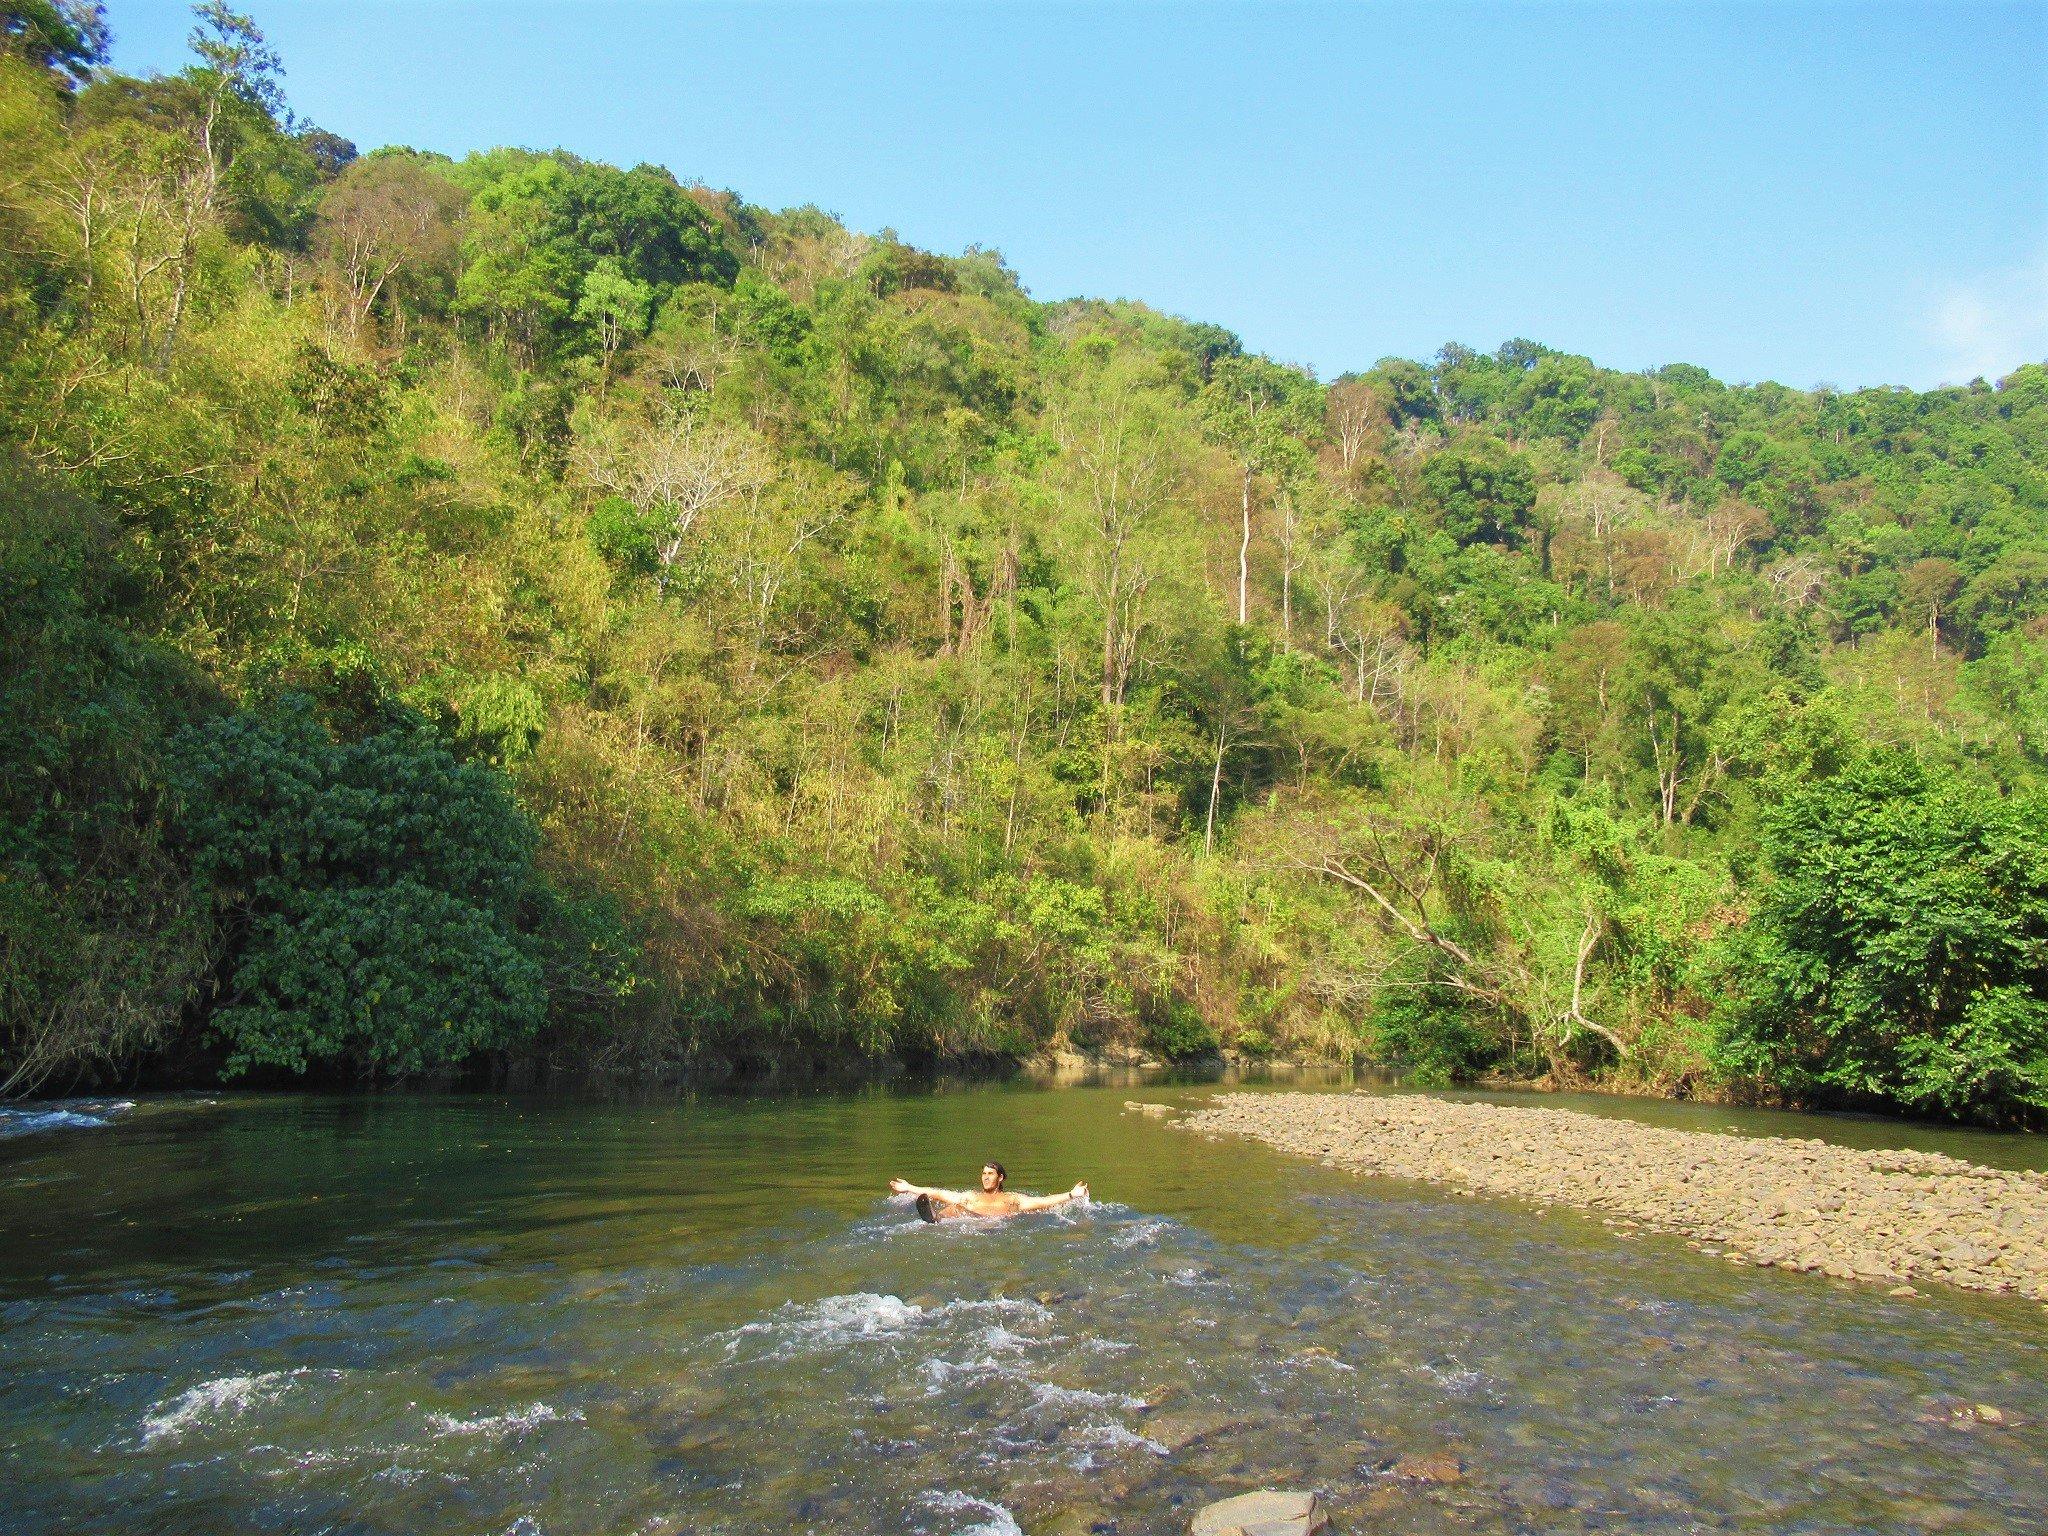 Wild camping on the La Nga River, Vietnam